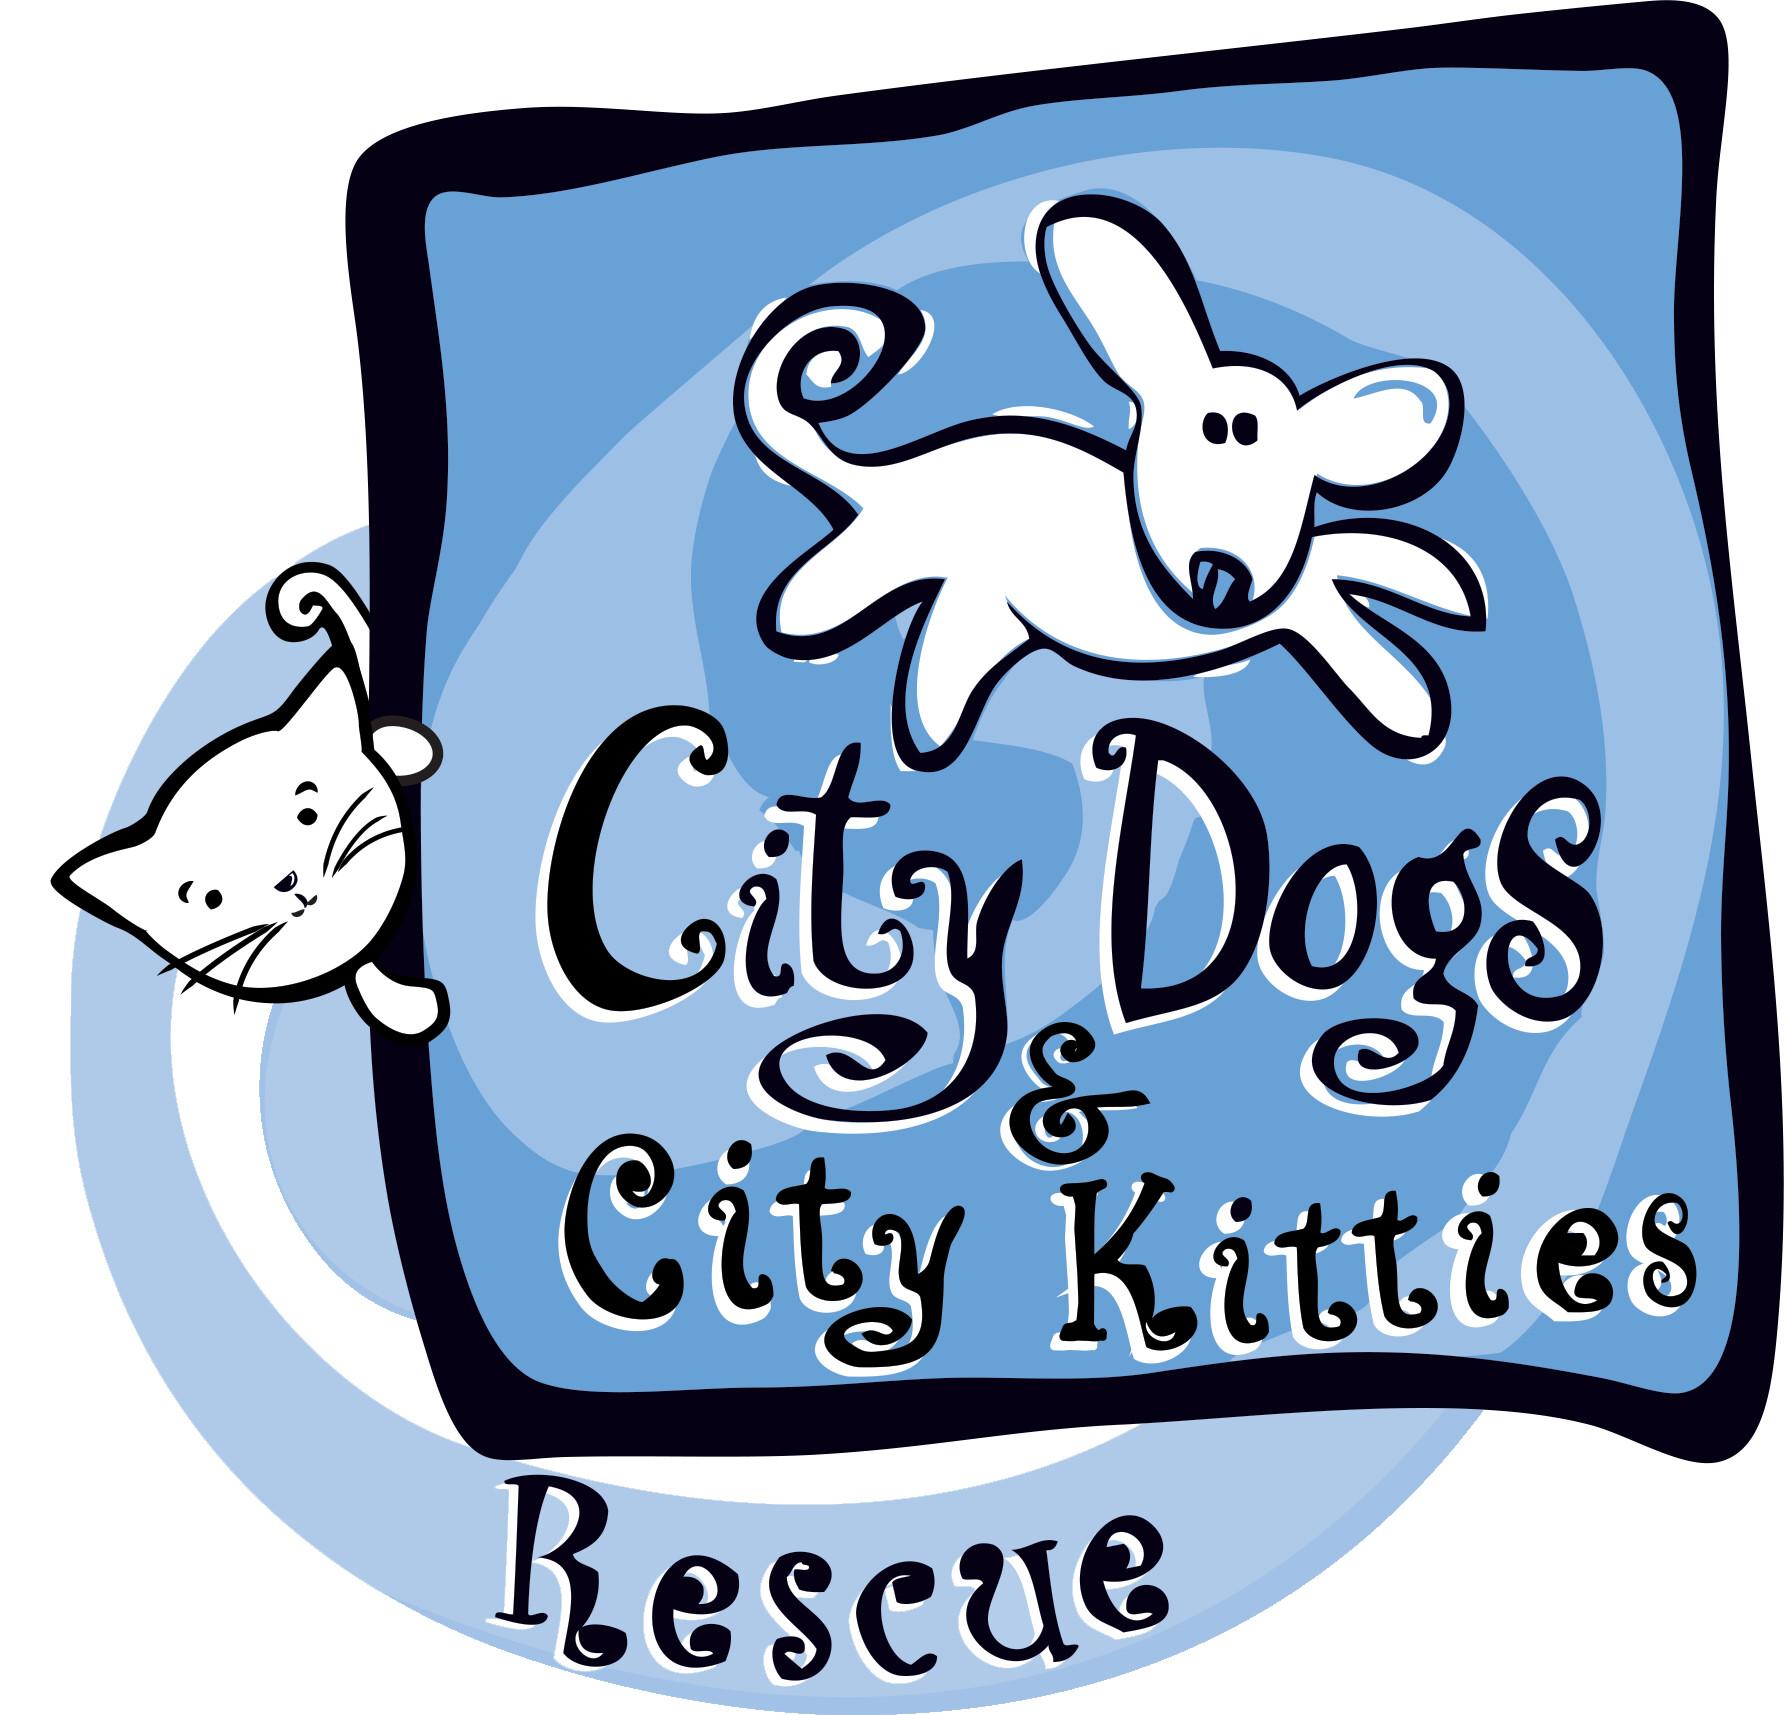 City Dogs Rescue & City Kitties